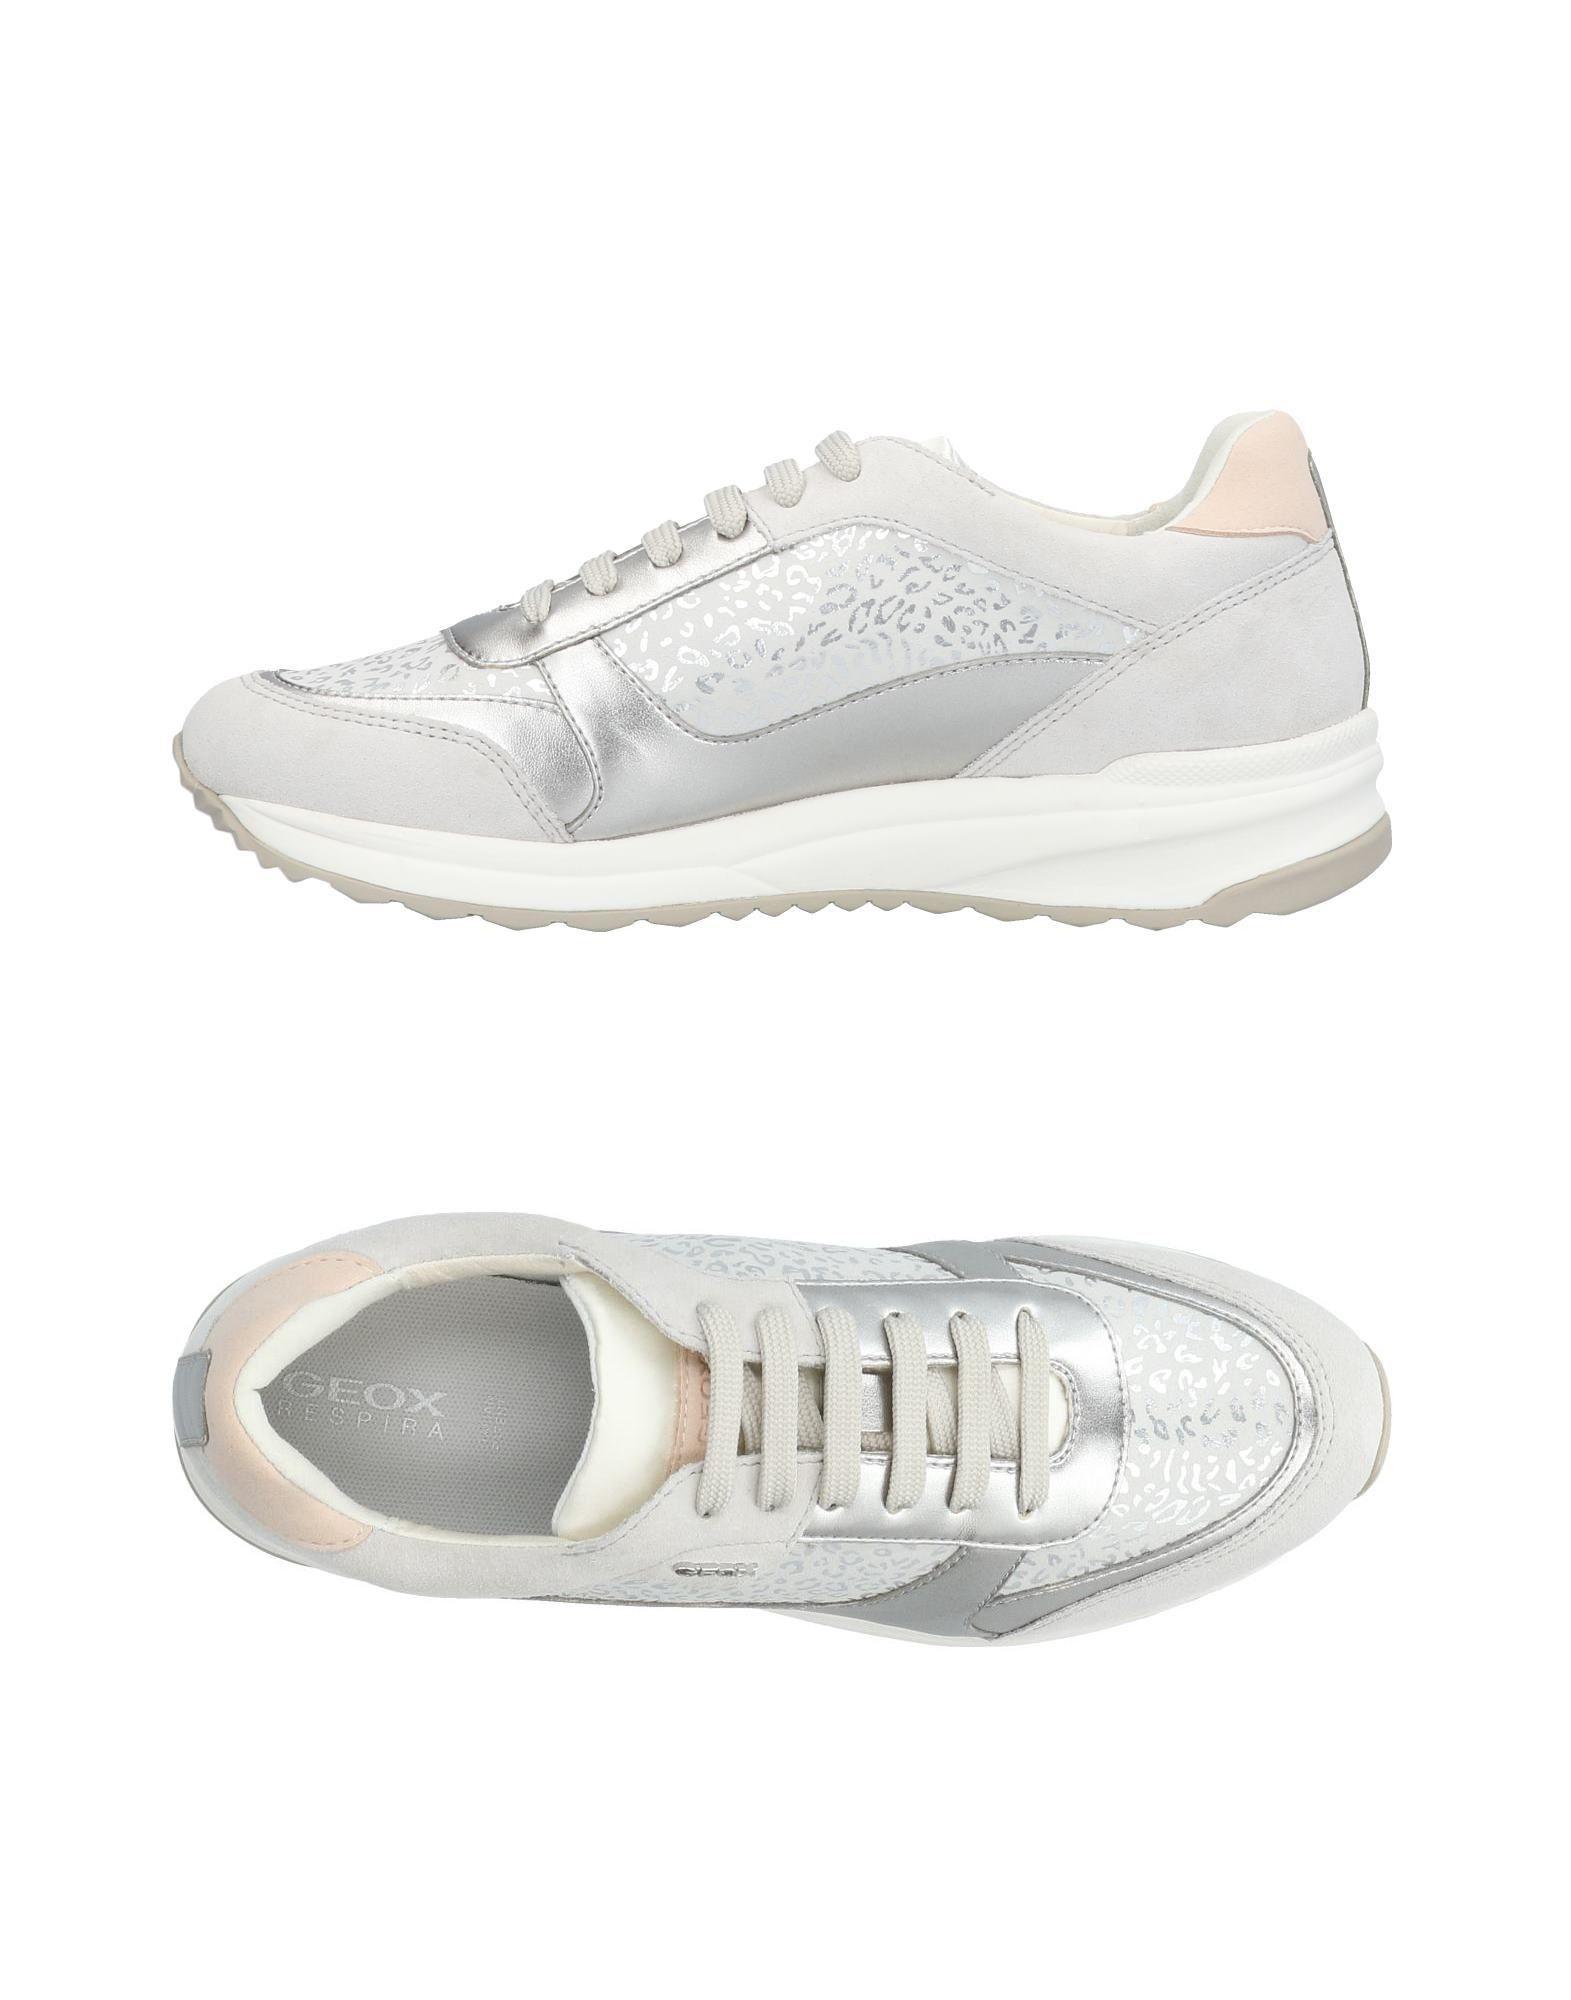 Sneakers Geox Donna - Acquista online su